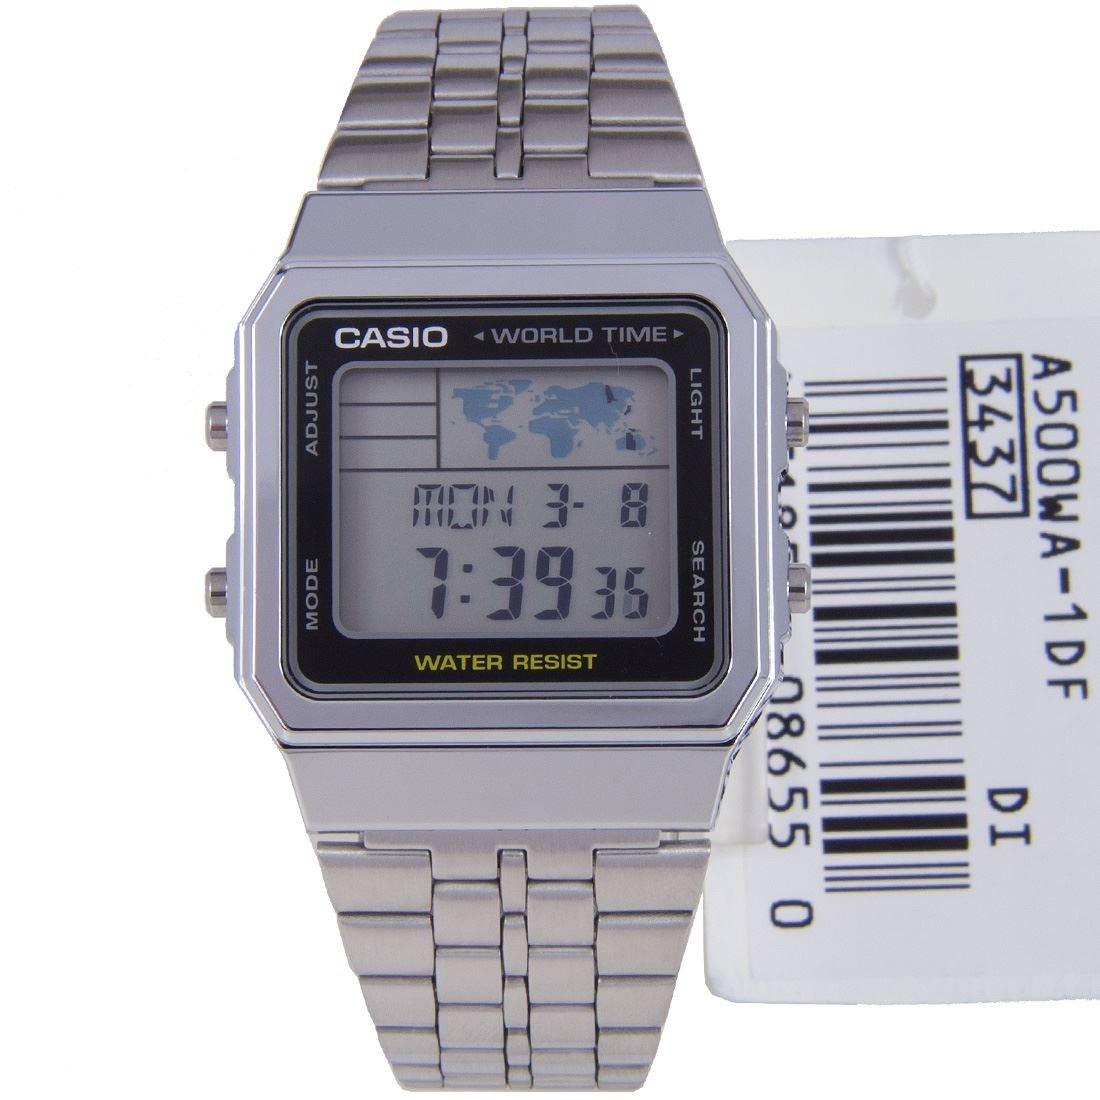 3d497a6537b6 reloj casio a500wa-1d vintage retro digital agente oficial. Cargando zoom.